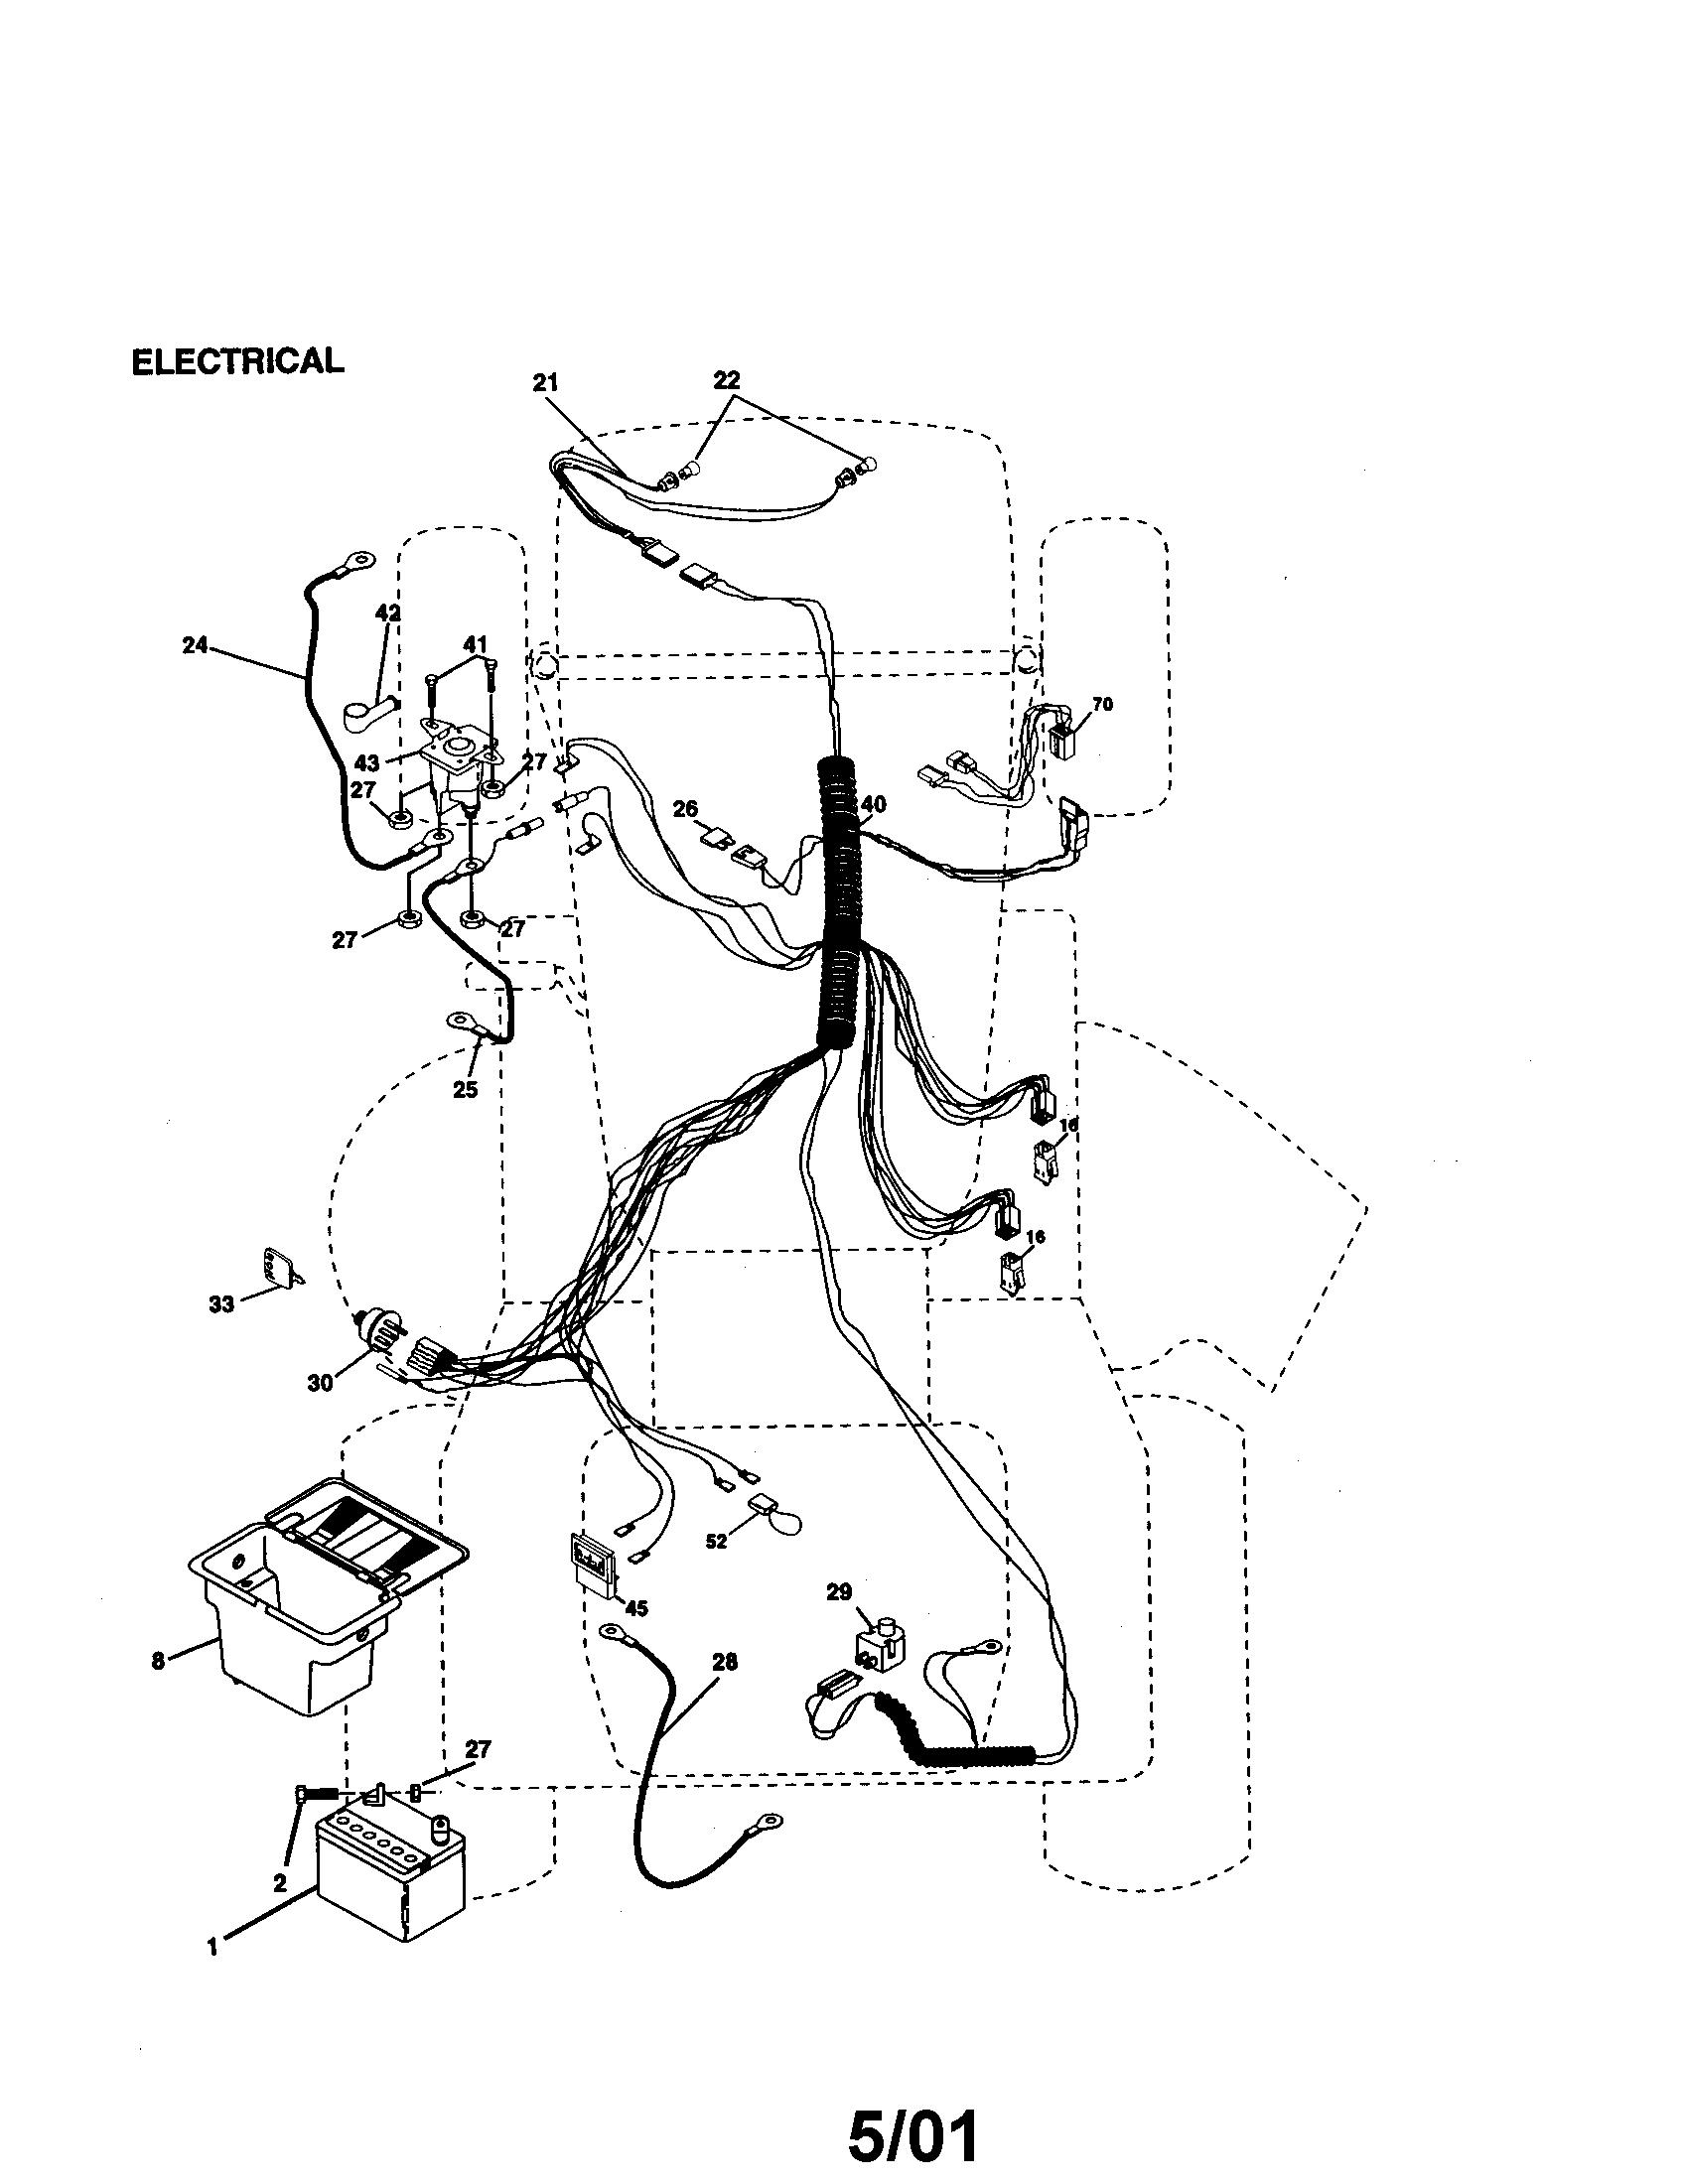 Craftsman 14 5hp 42